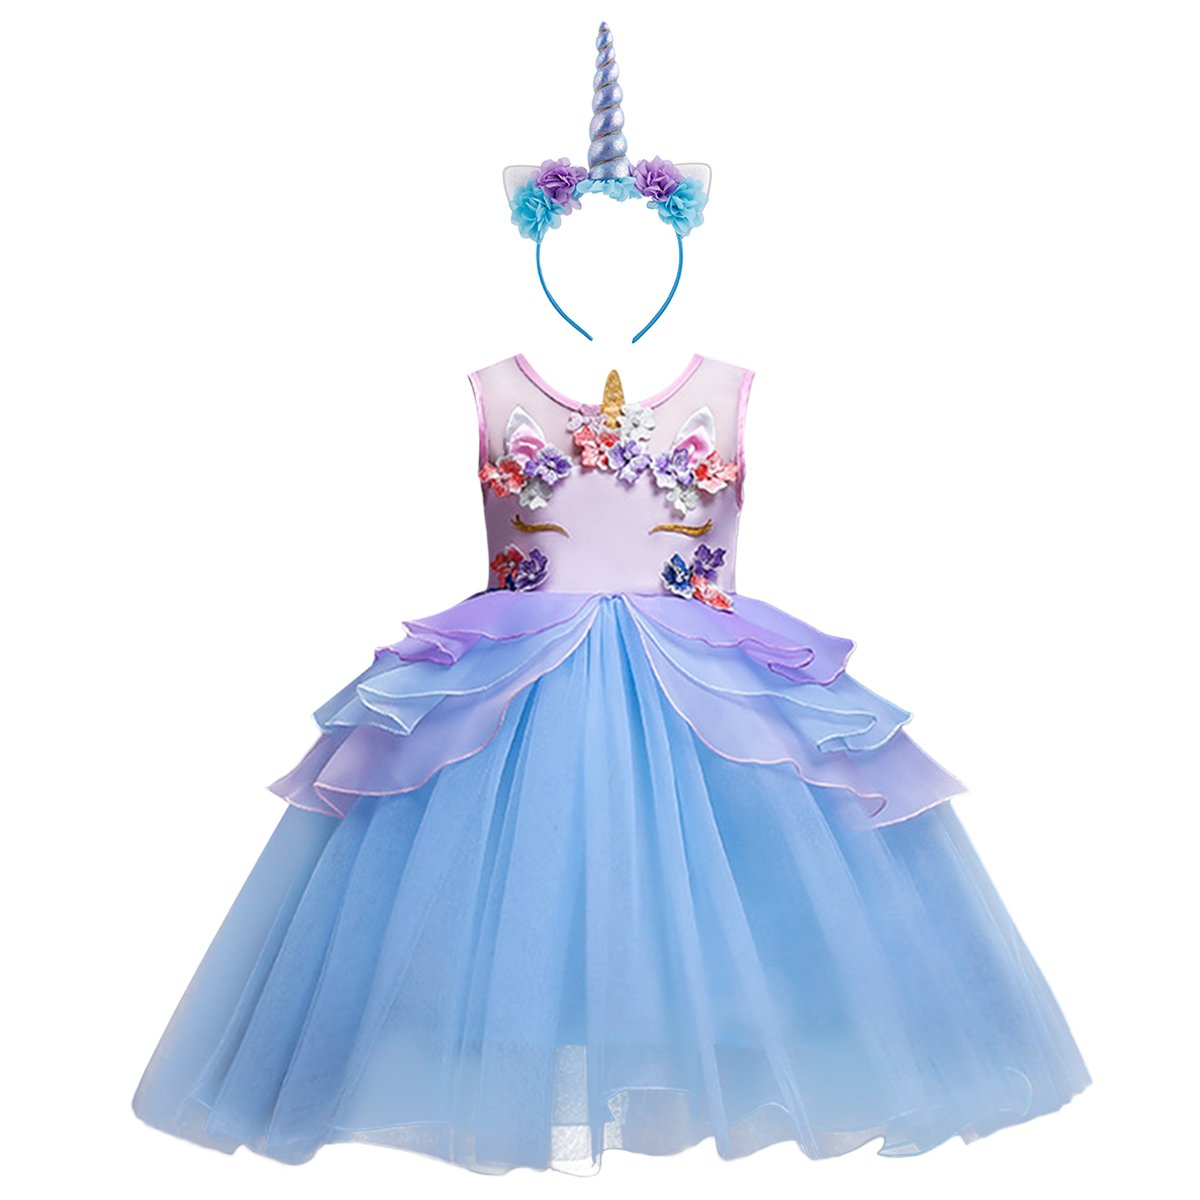 Baby Kids Girls Toddler Unicorn Dress Sleeveless Princess Tulle Dress Wedding Birthday Party Gown Performance Costume S# Blue 4-5 Years